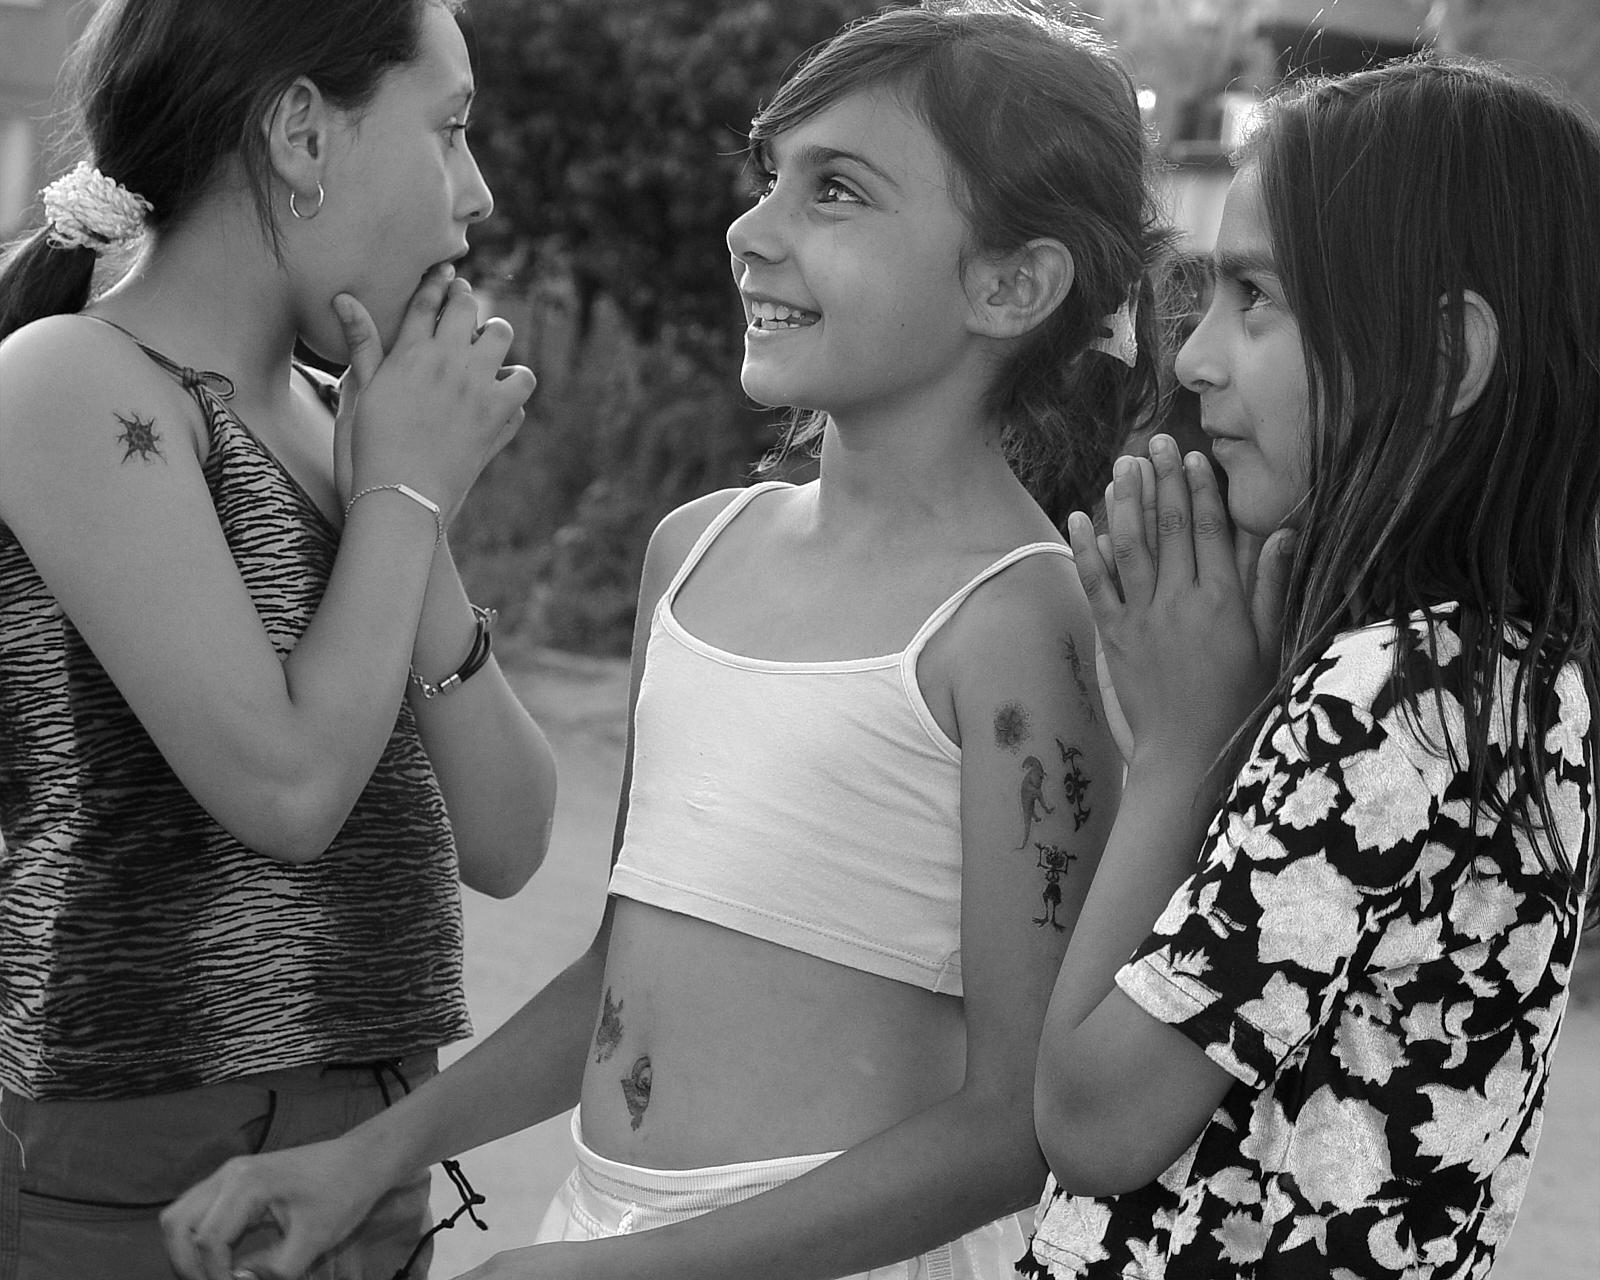 Roma girls, Bulgaria